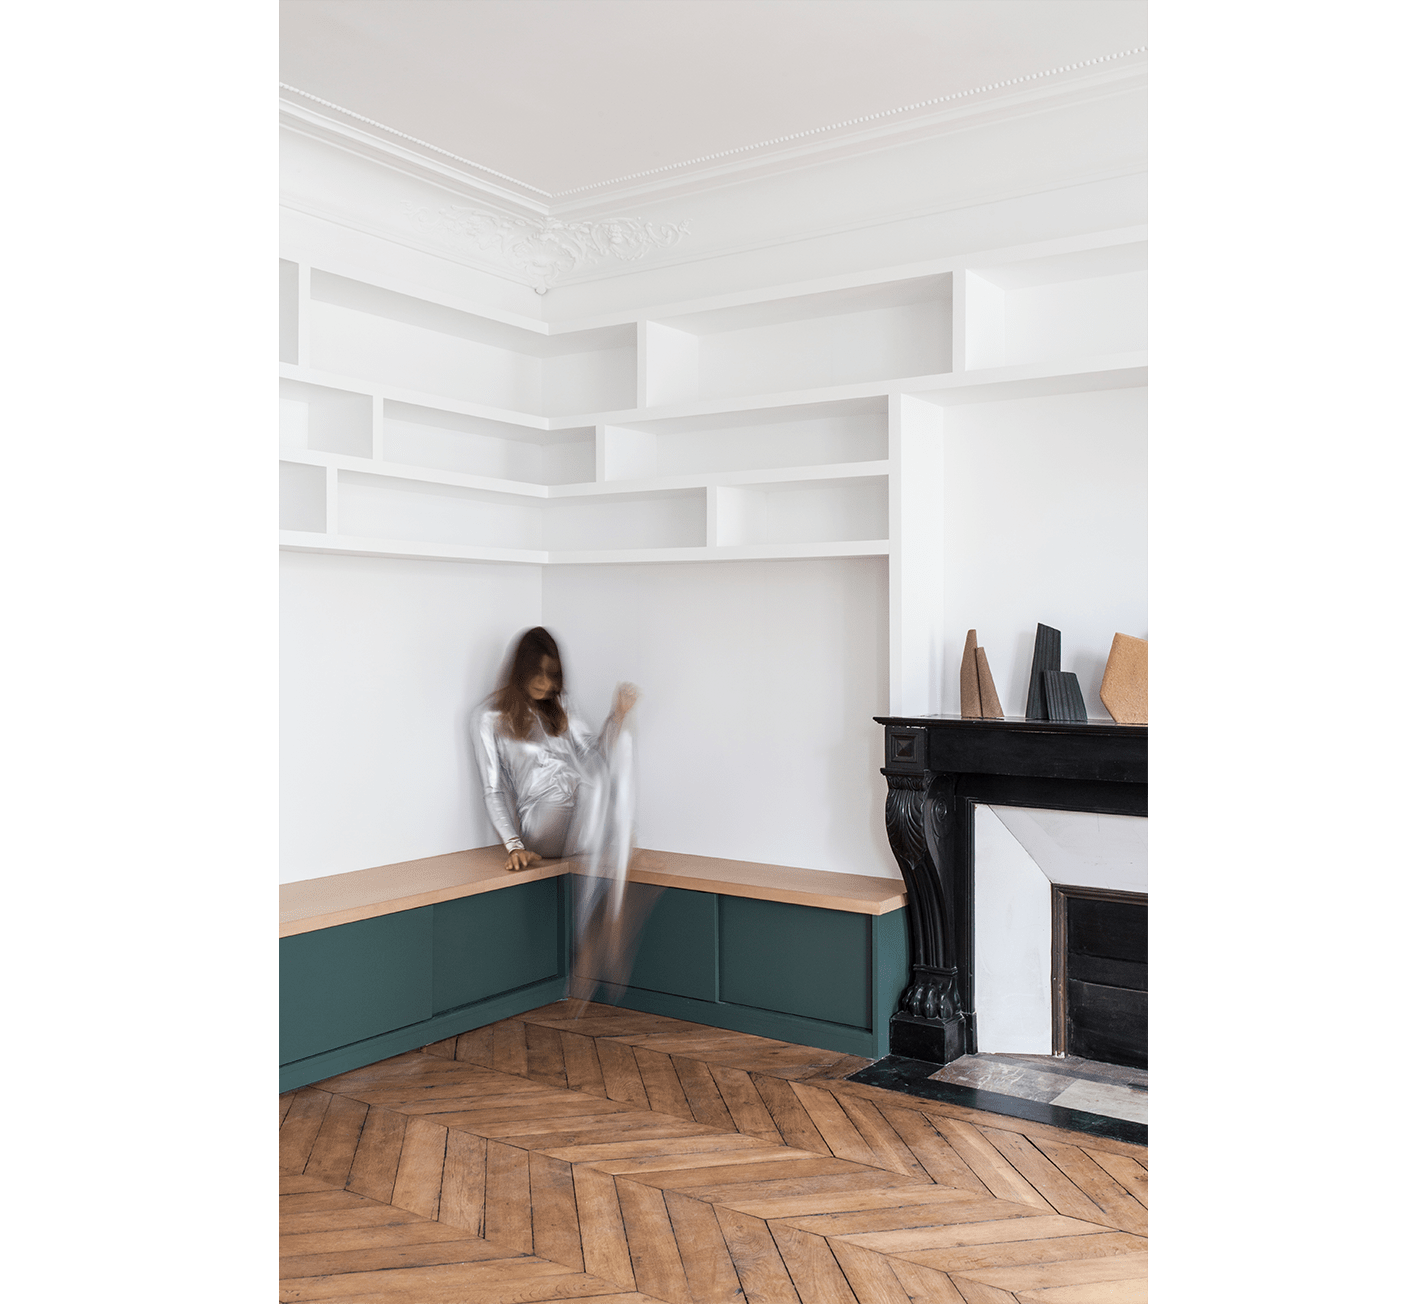 Projet-Jules-Cesar-Atelier-Steve-Pauline-Borgia-Architecte-interieur-06-min